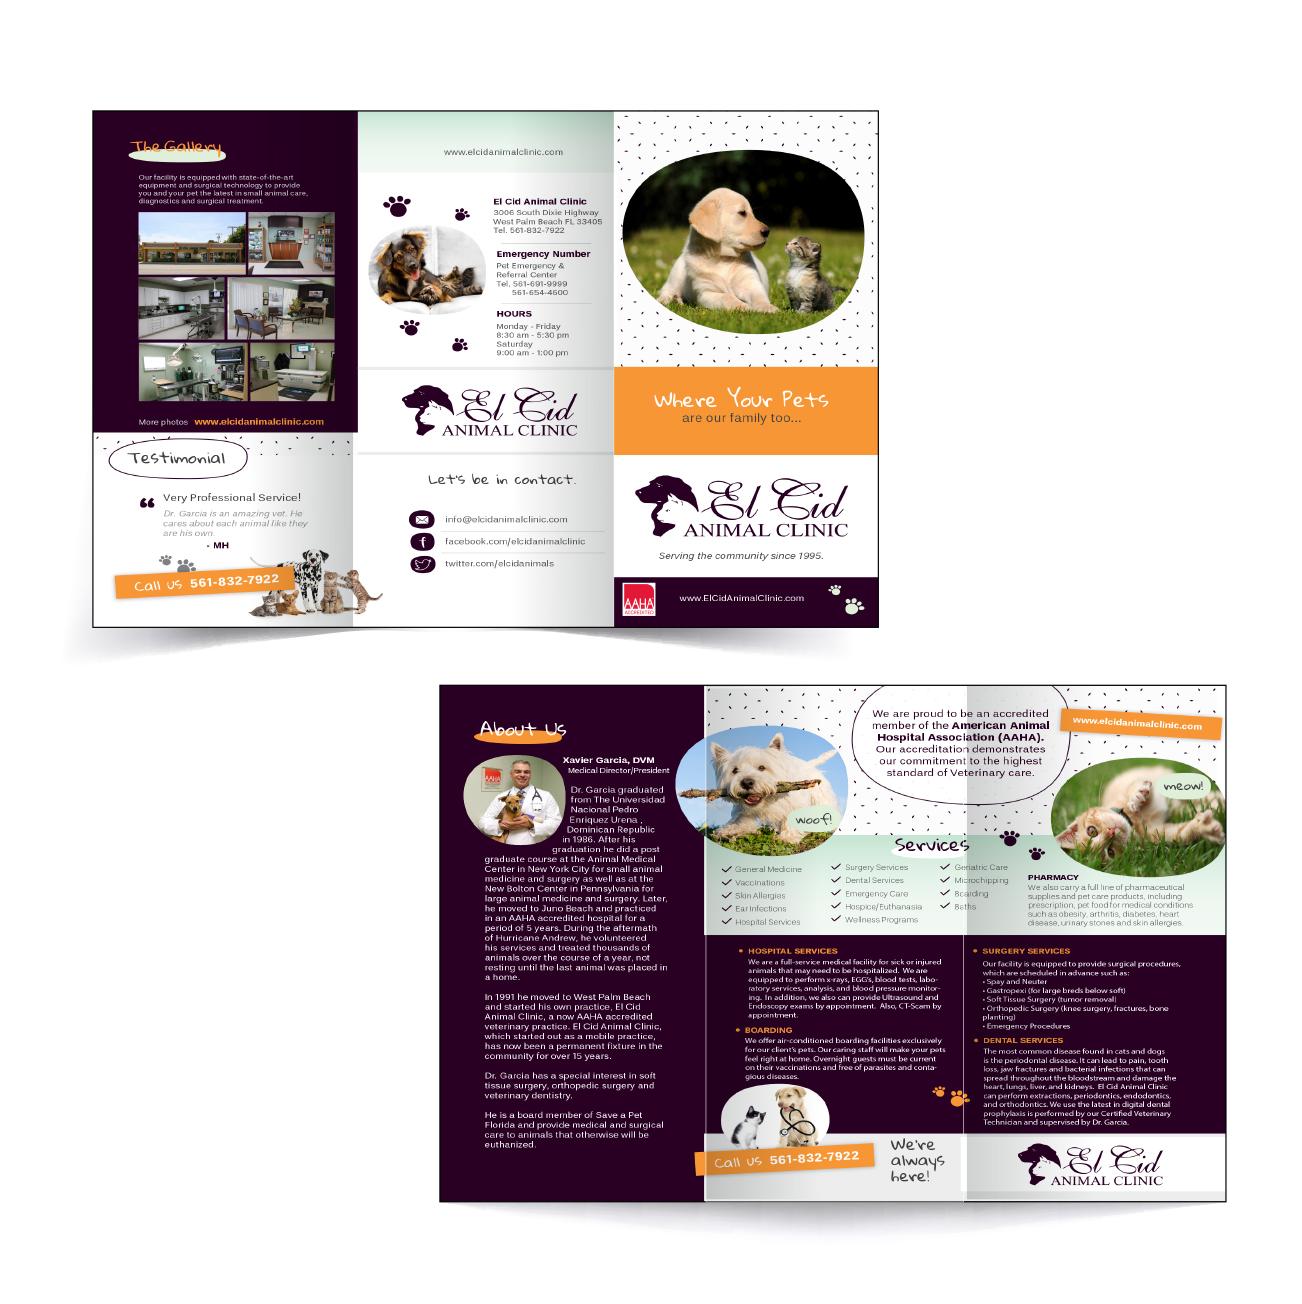 El Cid Animal Clinic Brochure Design